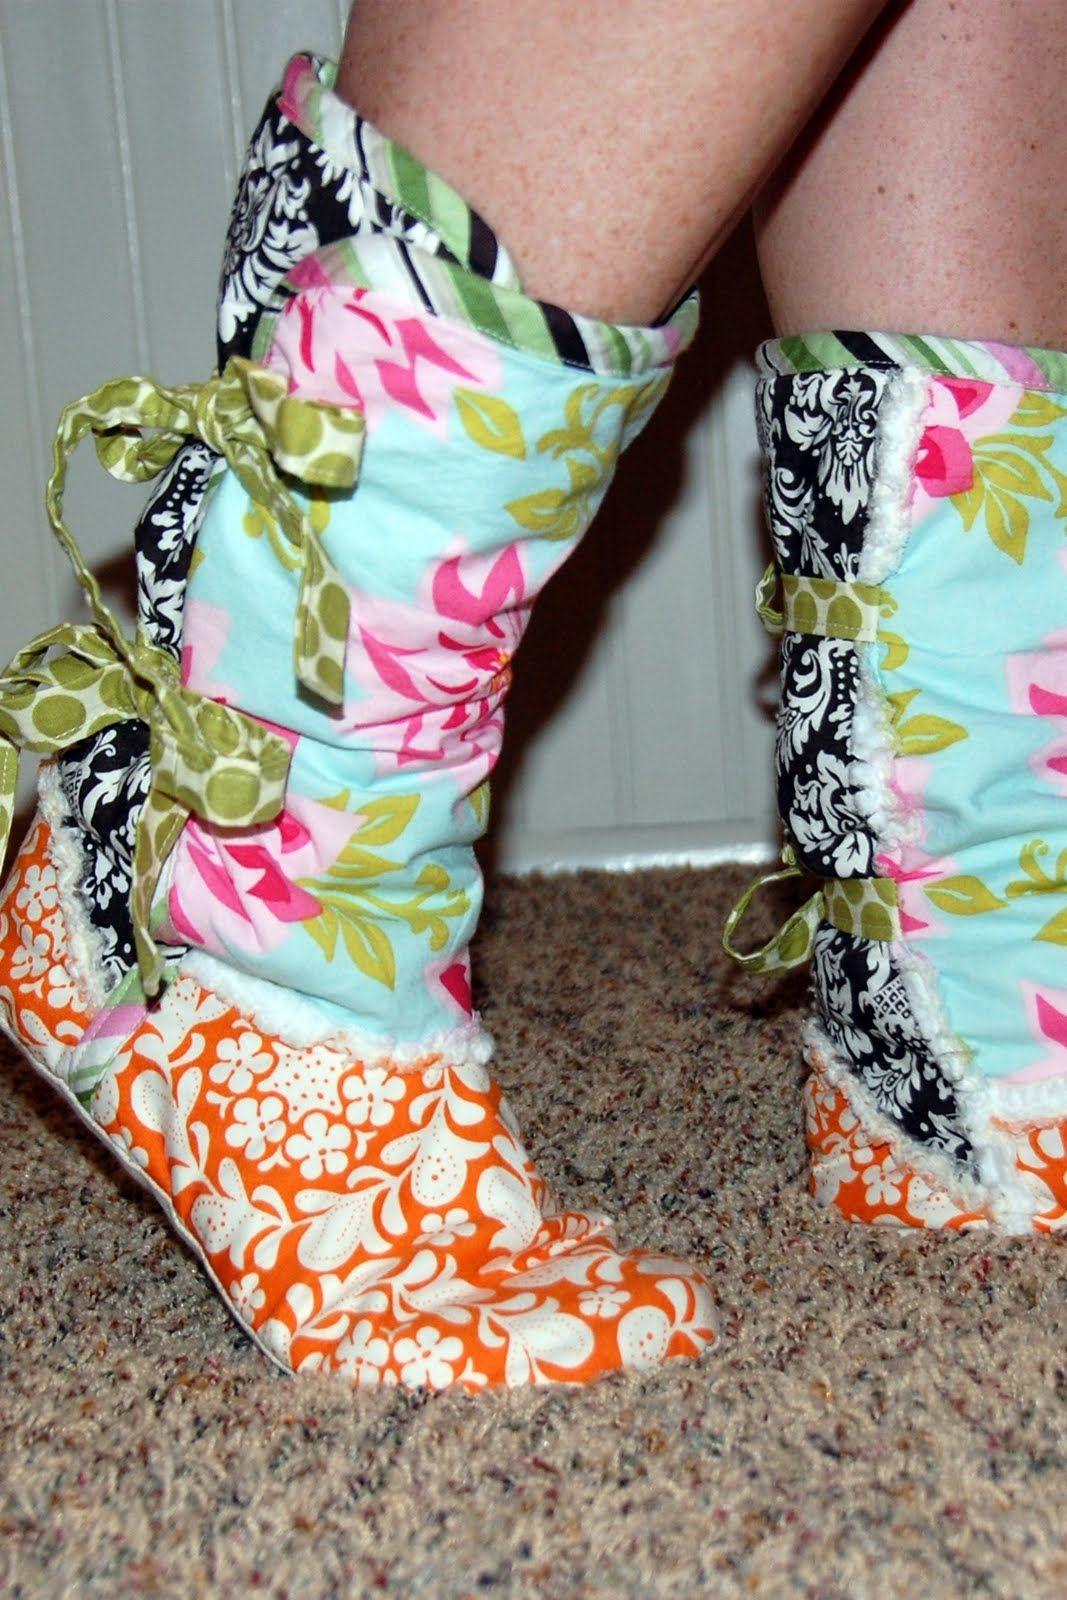 Printable Fleece Slipper Pattern   Fleece Moccasin Slipper Boots - Free Printable Fleece Sock Pattern